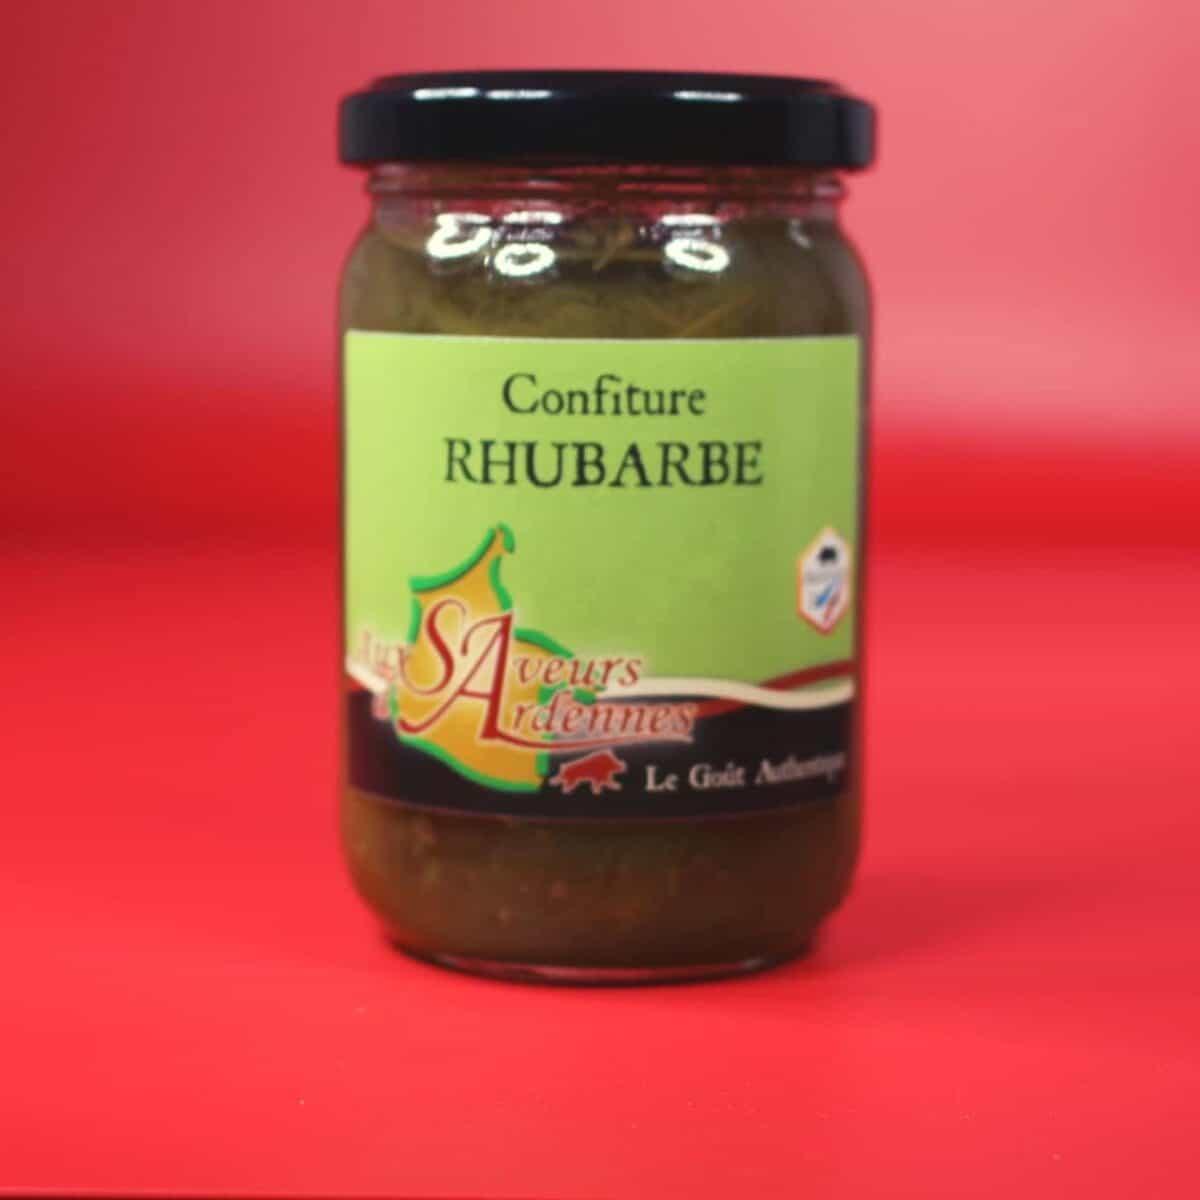 Confiture Rhubarbe, Saveurs D'ardennes, Vat